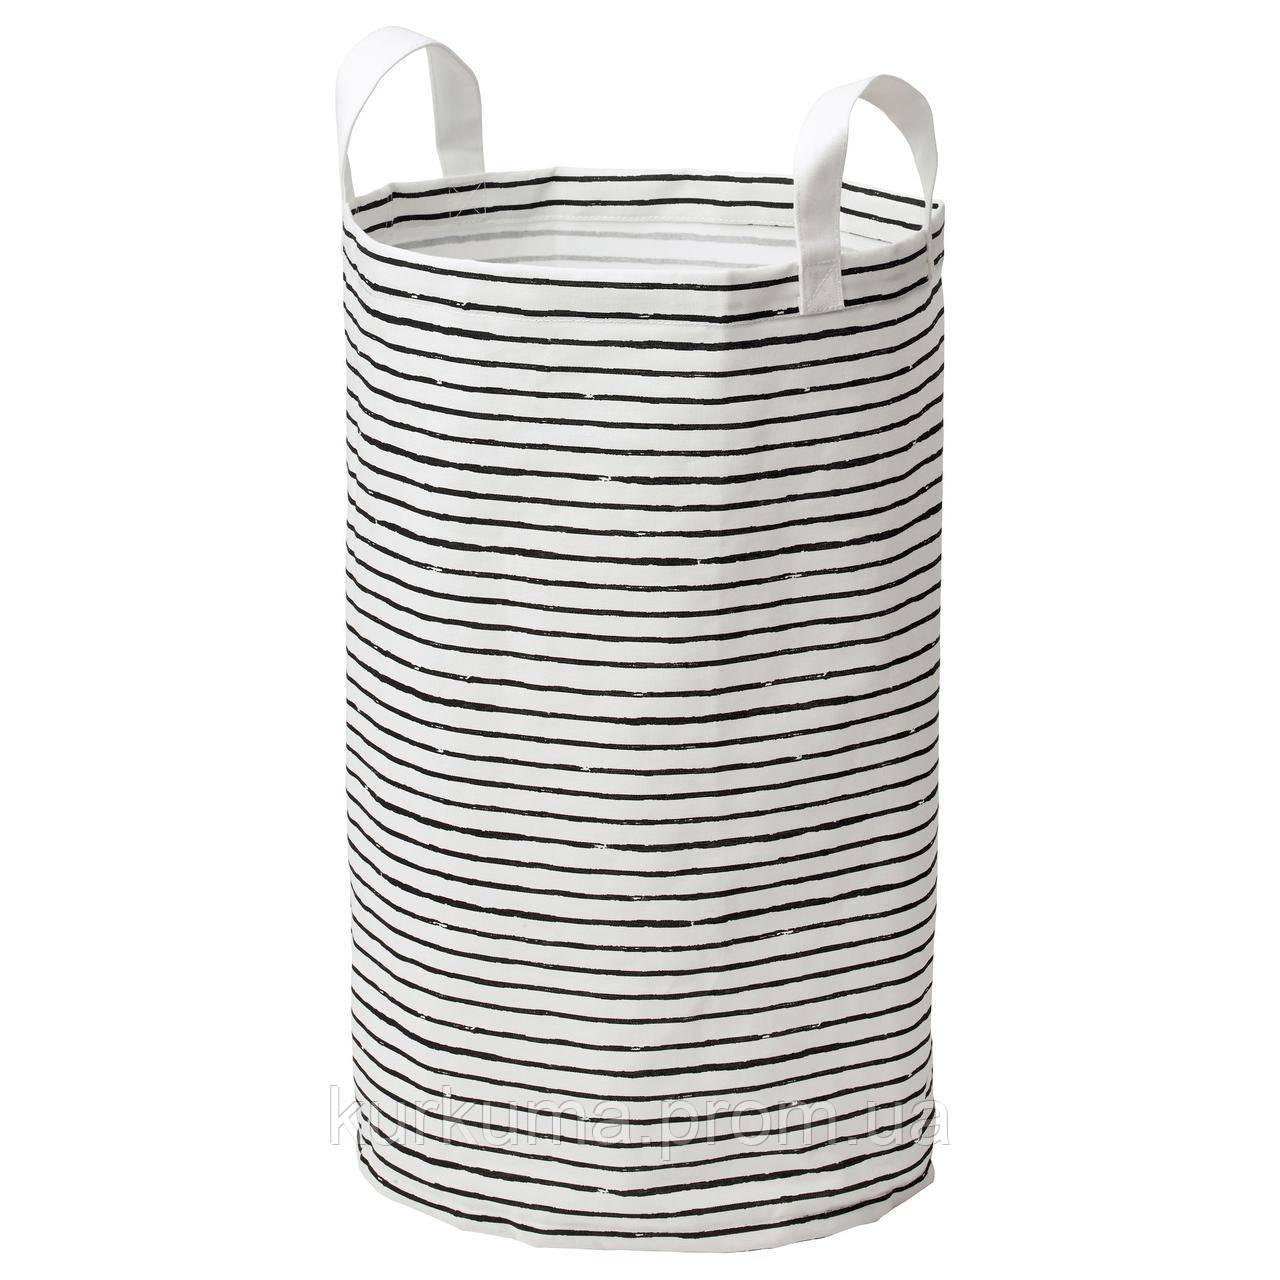 IKEA KLUNKA Корзина для хранения, белый, черный  (503.643.71)